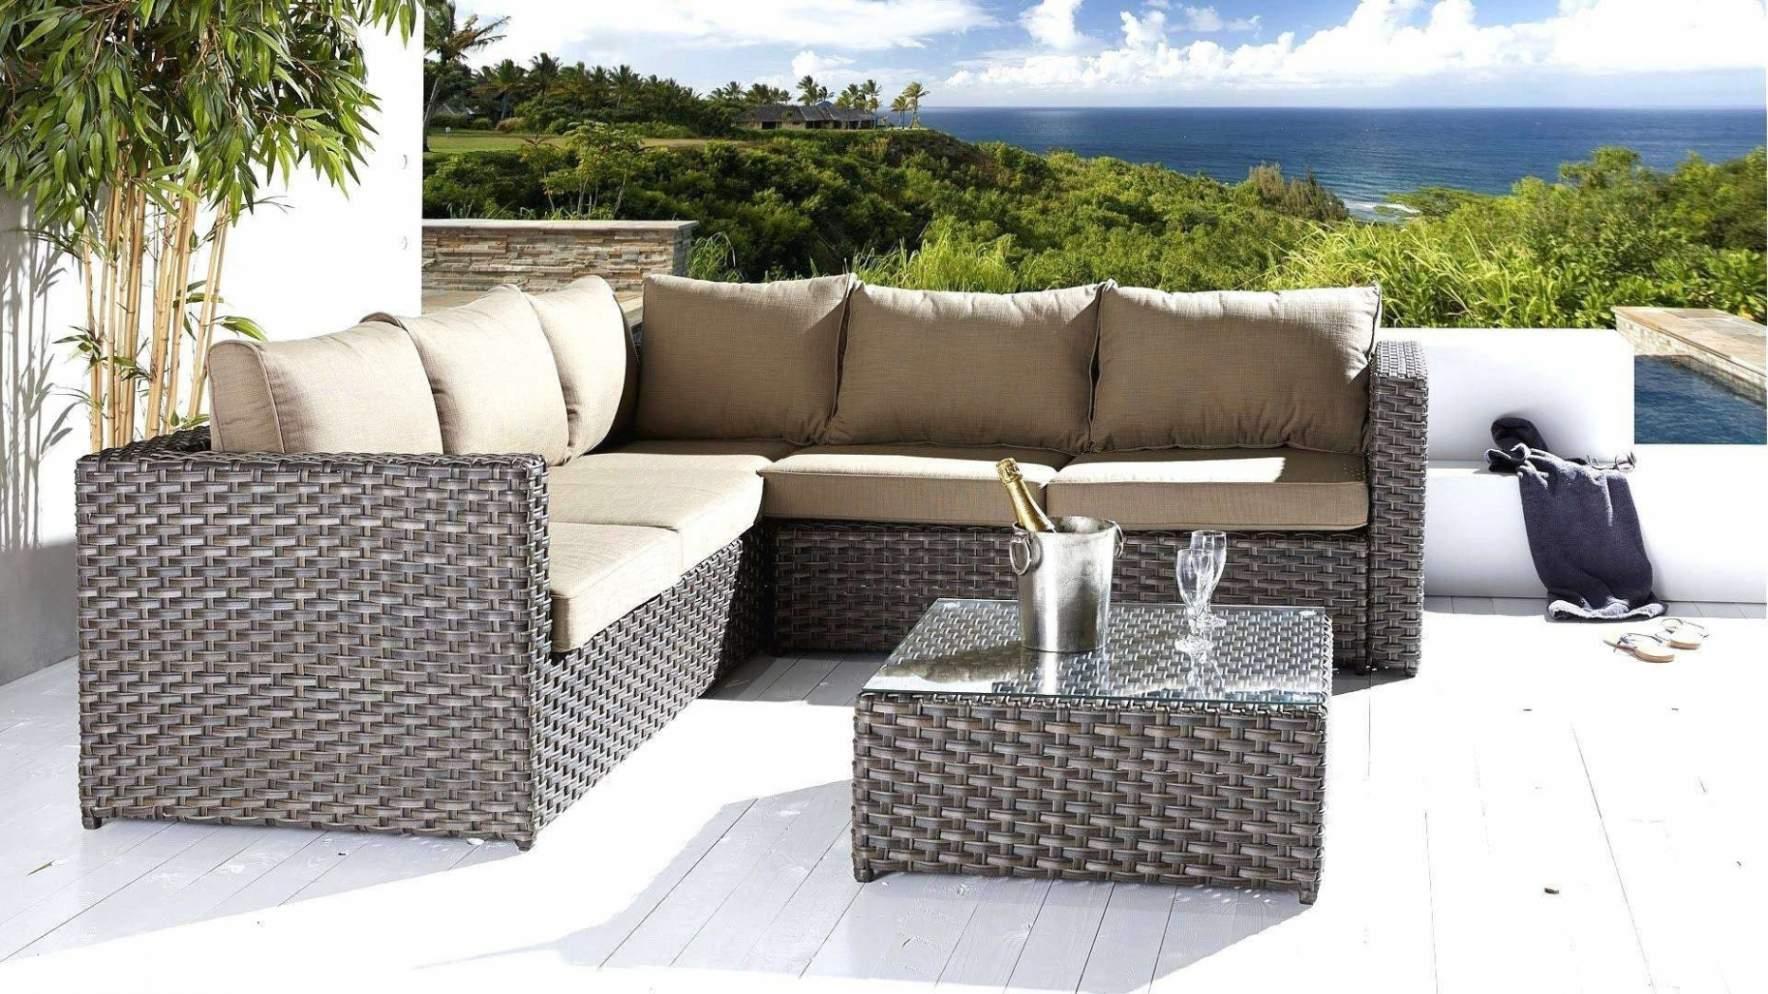 lounge mobel selber bauen yct projekte lounge mobel selber bauen lounge mobel selber bauen 2